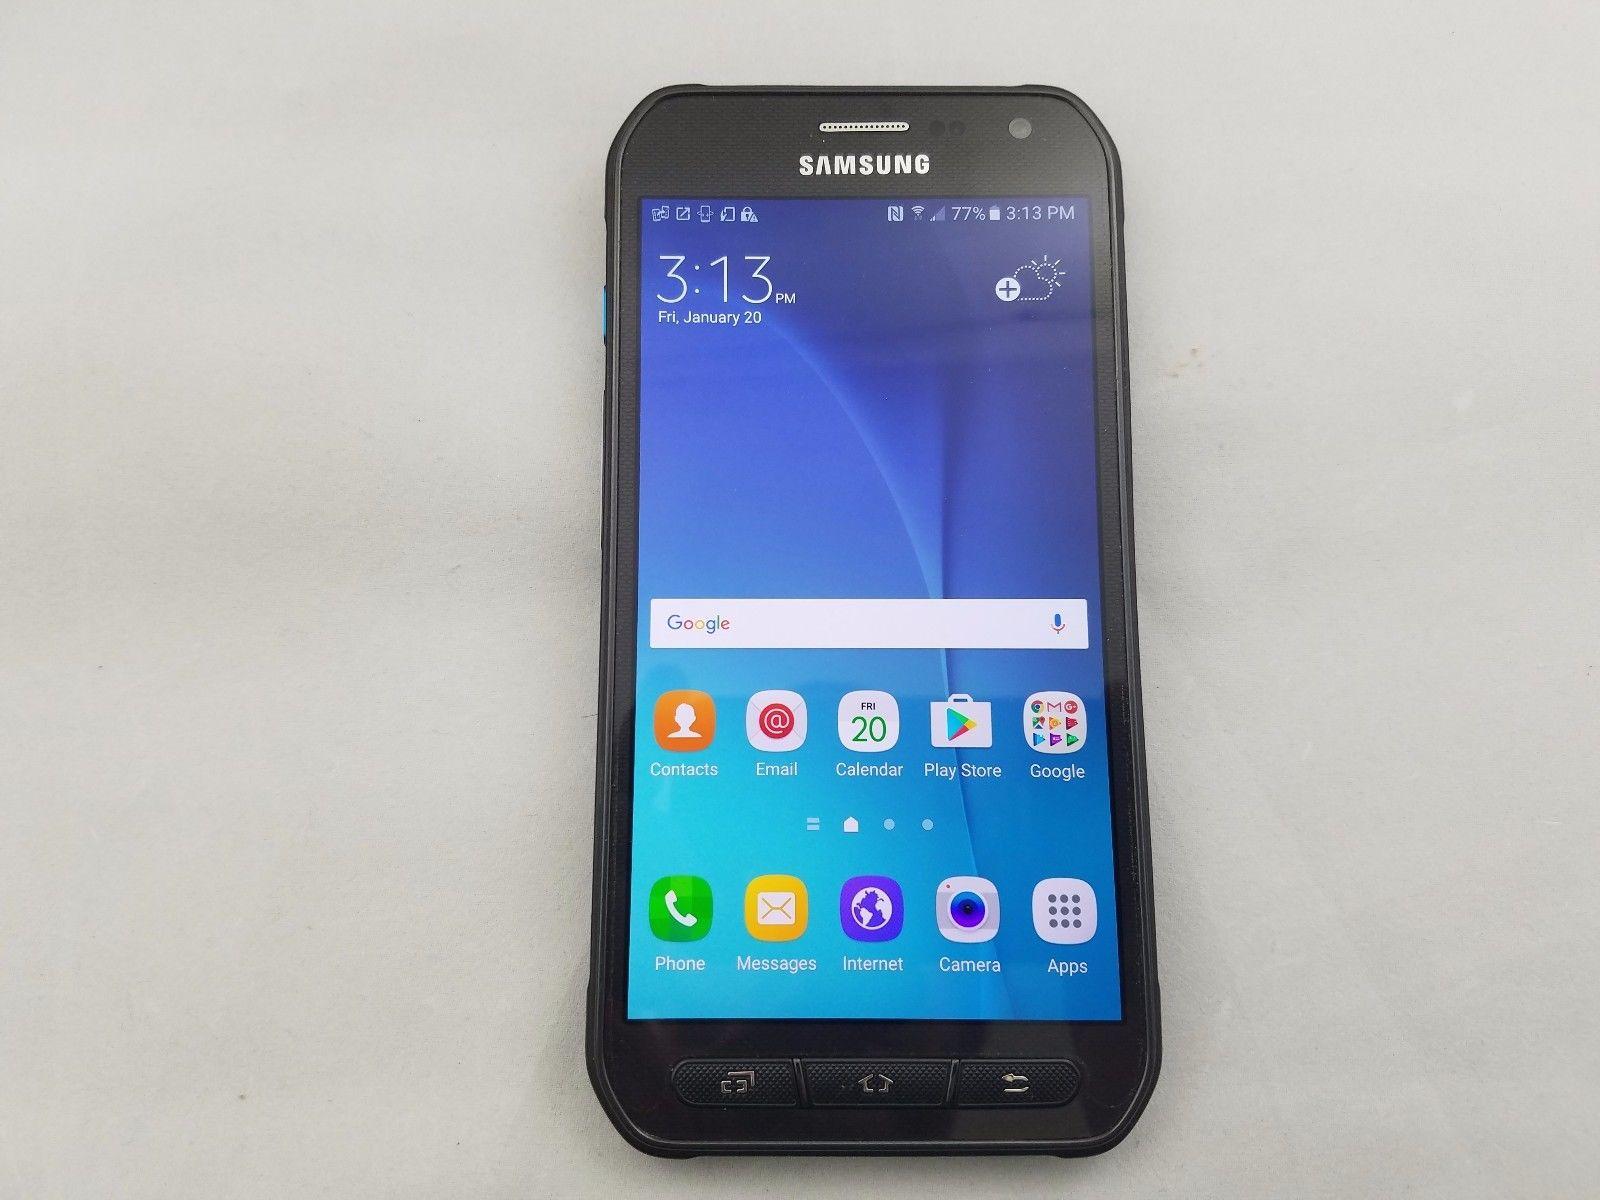 samsung galaxy s6 active g890a 32gb lte smartphone at t cricket no contract ebay. Black Bedroom Furniture Sets. Home Design Ideas